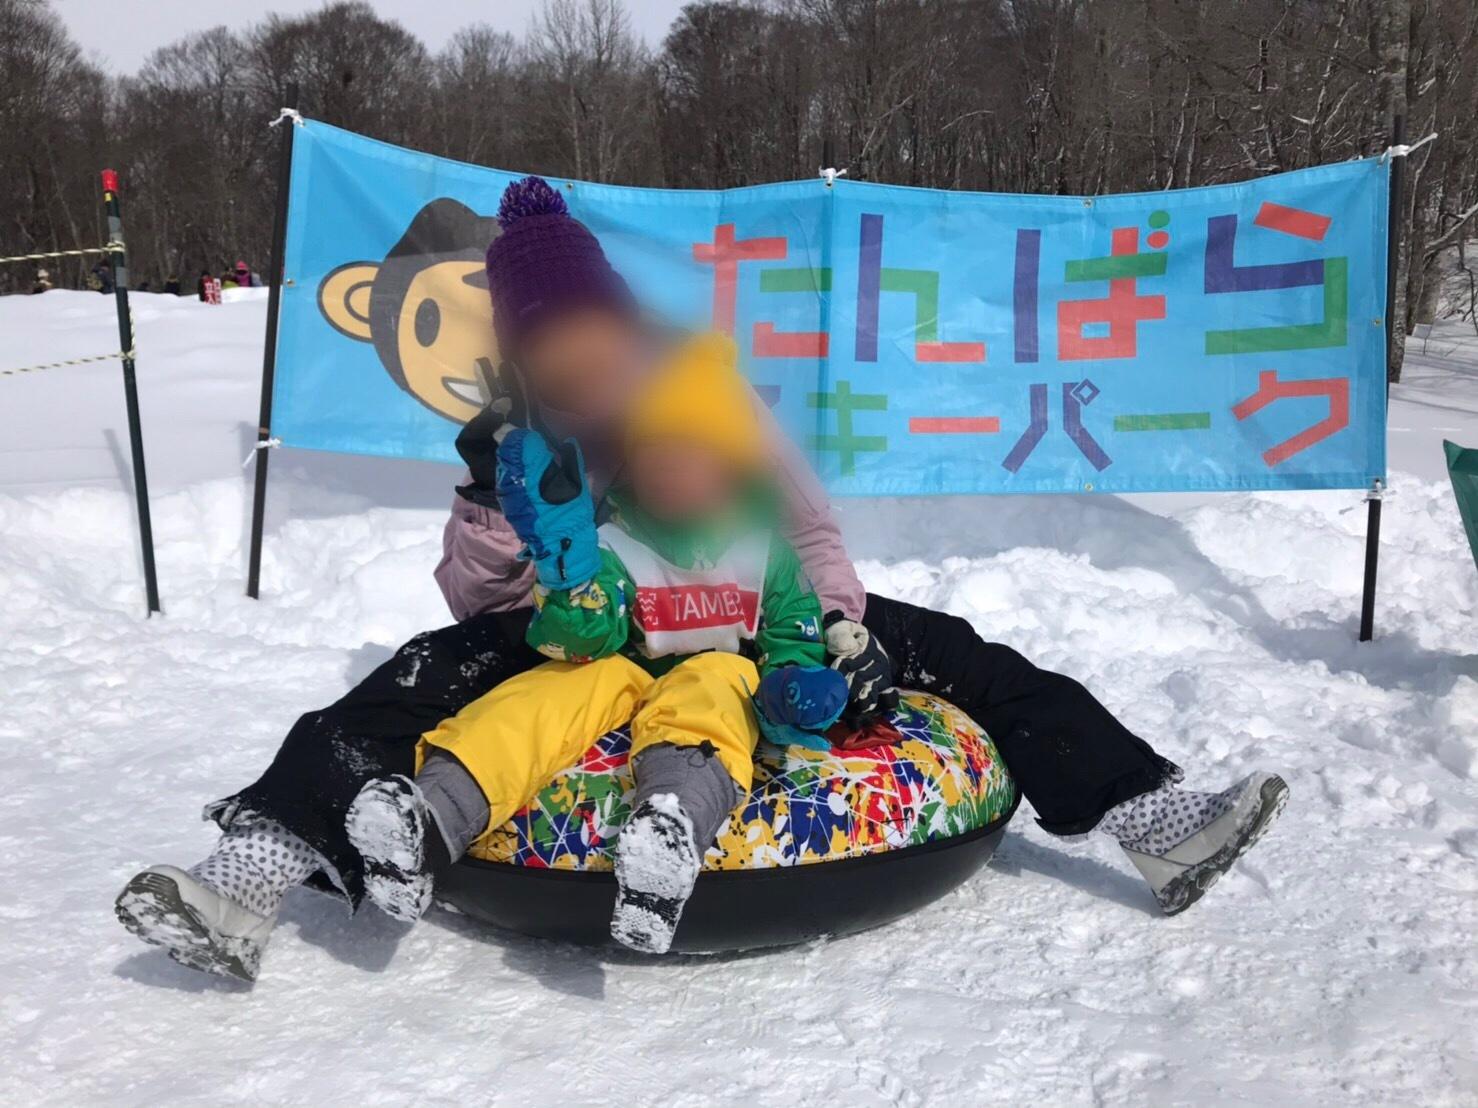 ❄️雪遊び❄️_e0341328_16325873.jpeg